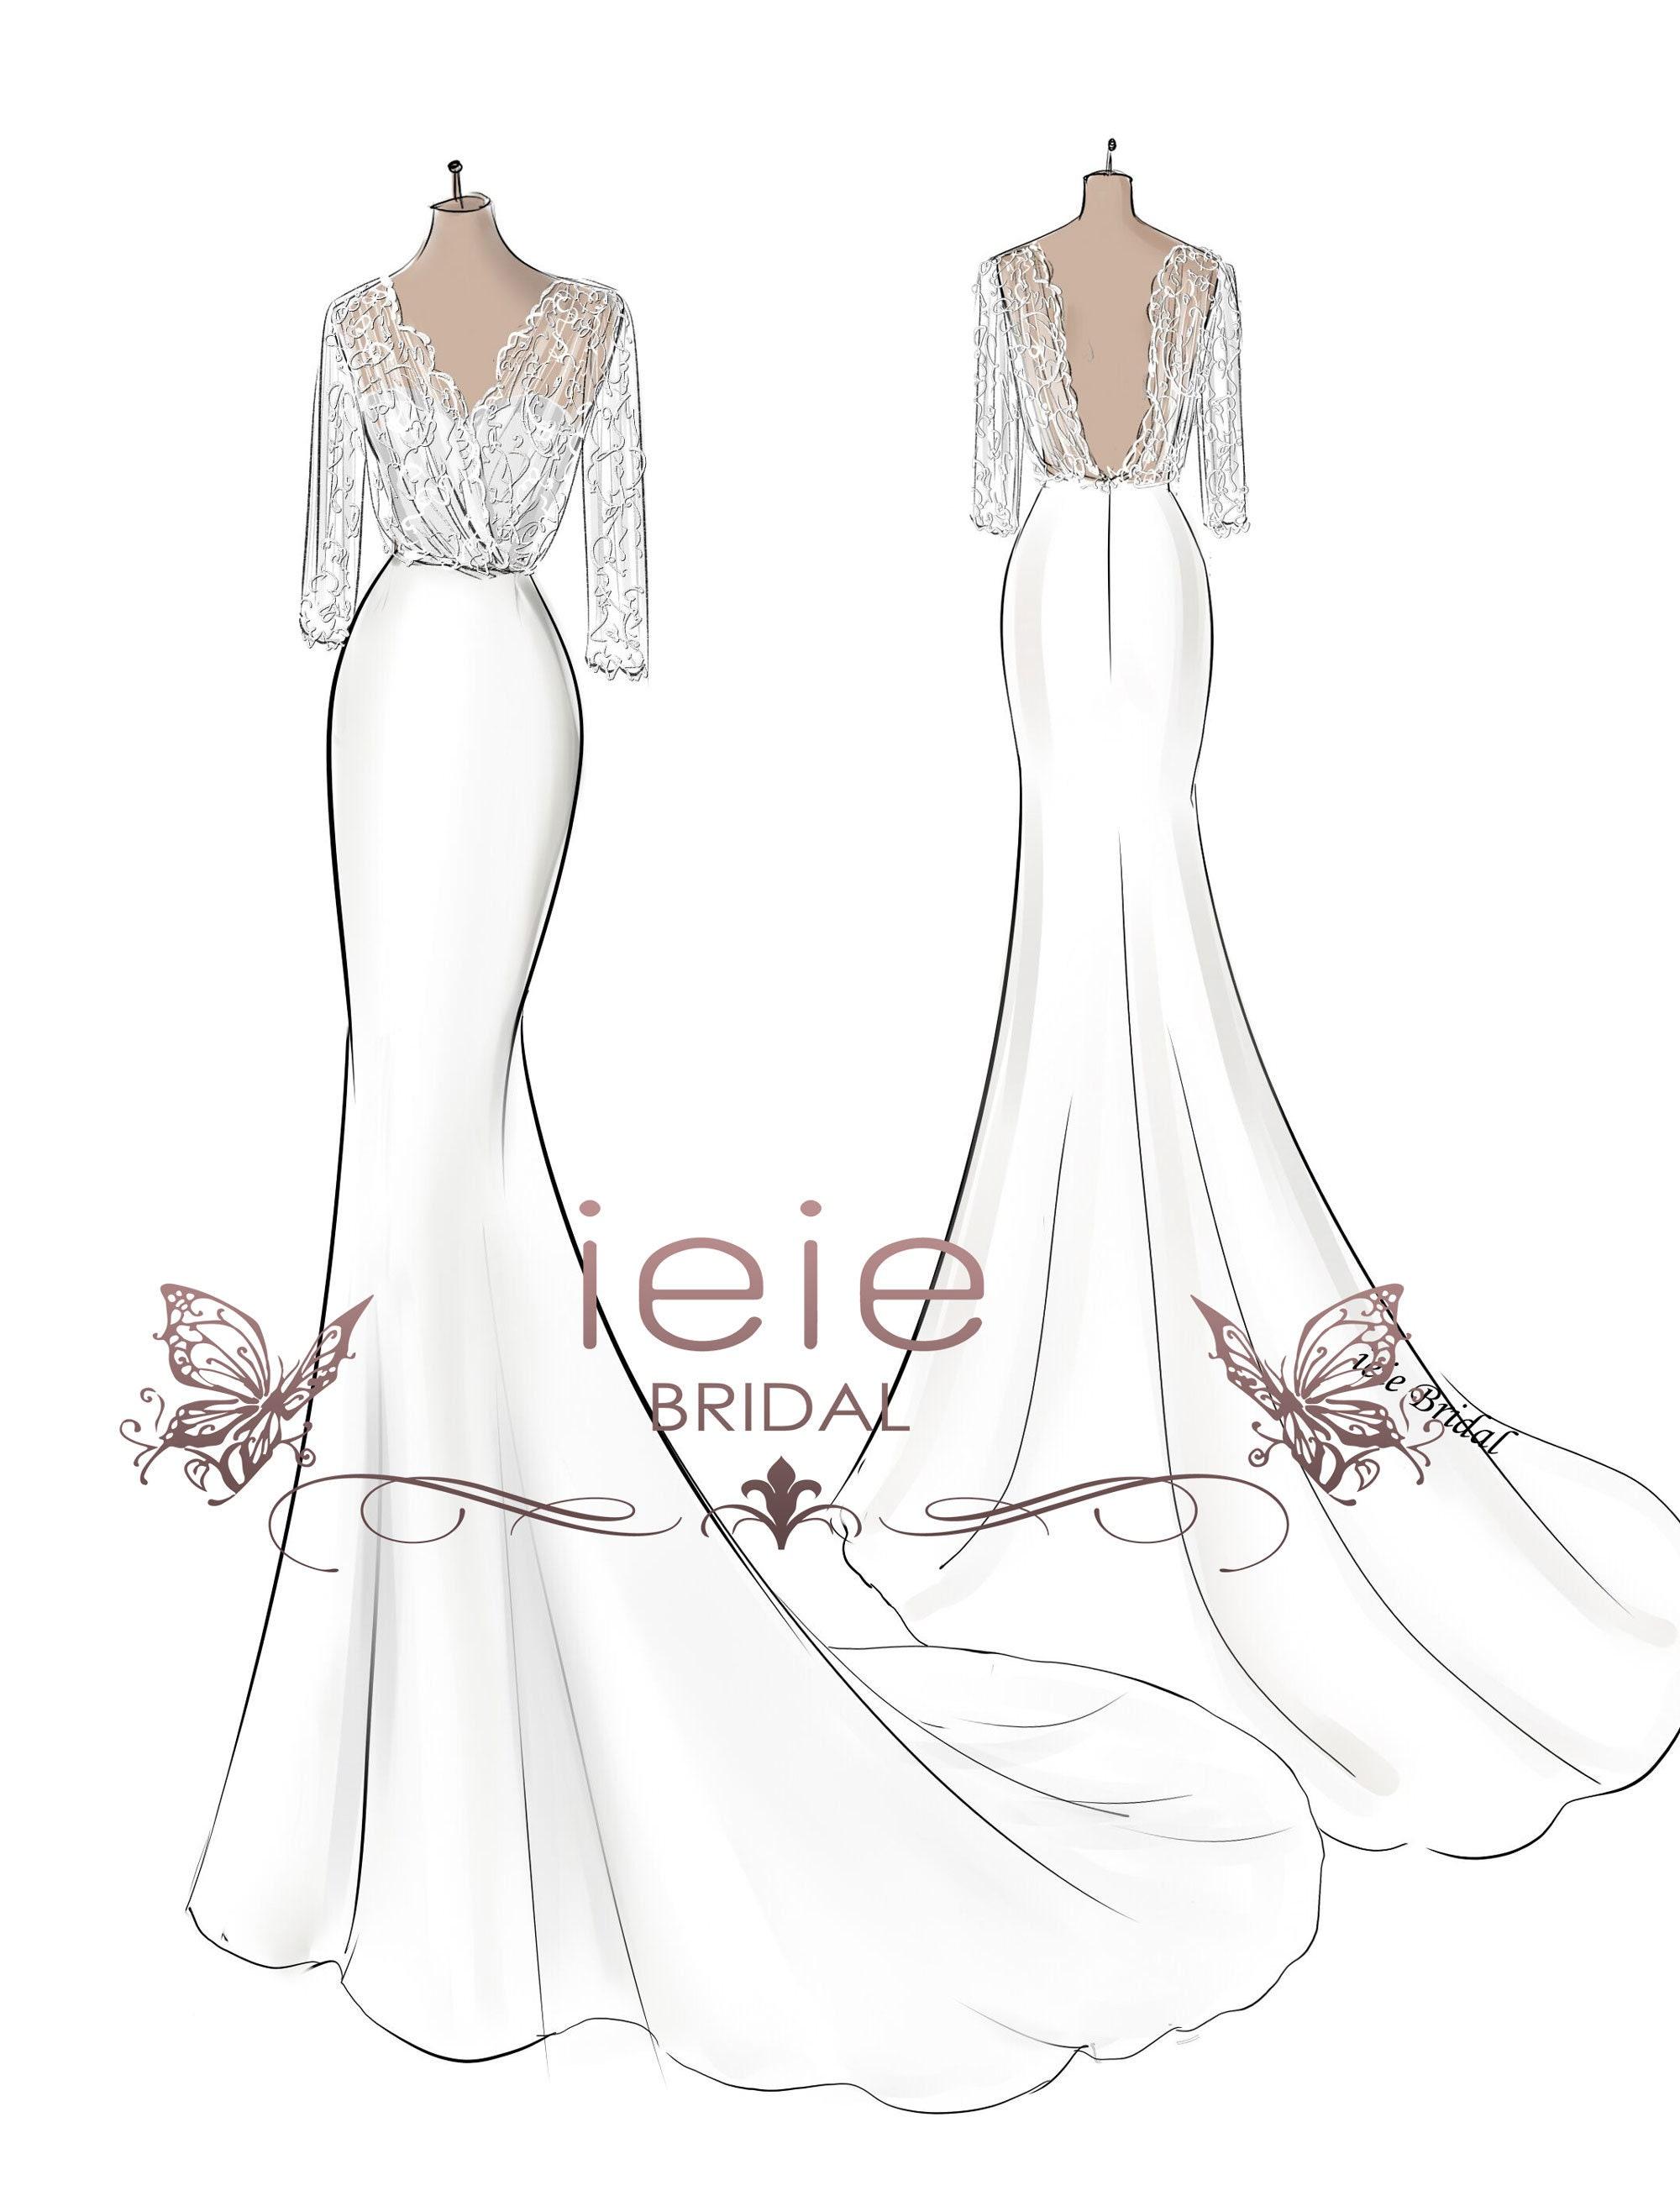 Custom Wedding Dress Sketch, Custom Sketches, Wedding Dress Pictures,  Wedding Gift, Fashion Sketch, Personalized Dress Sketch